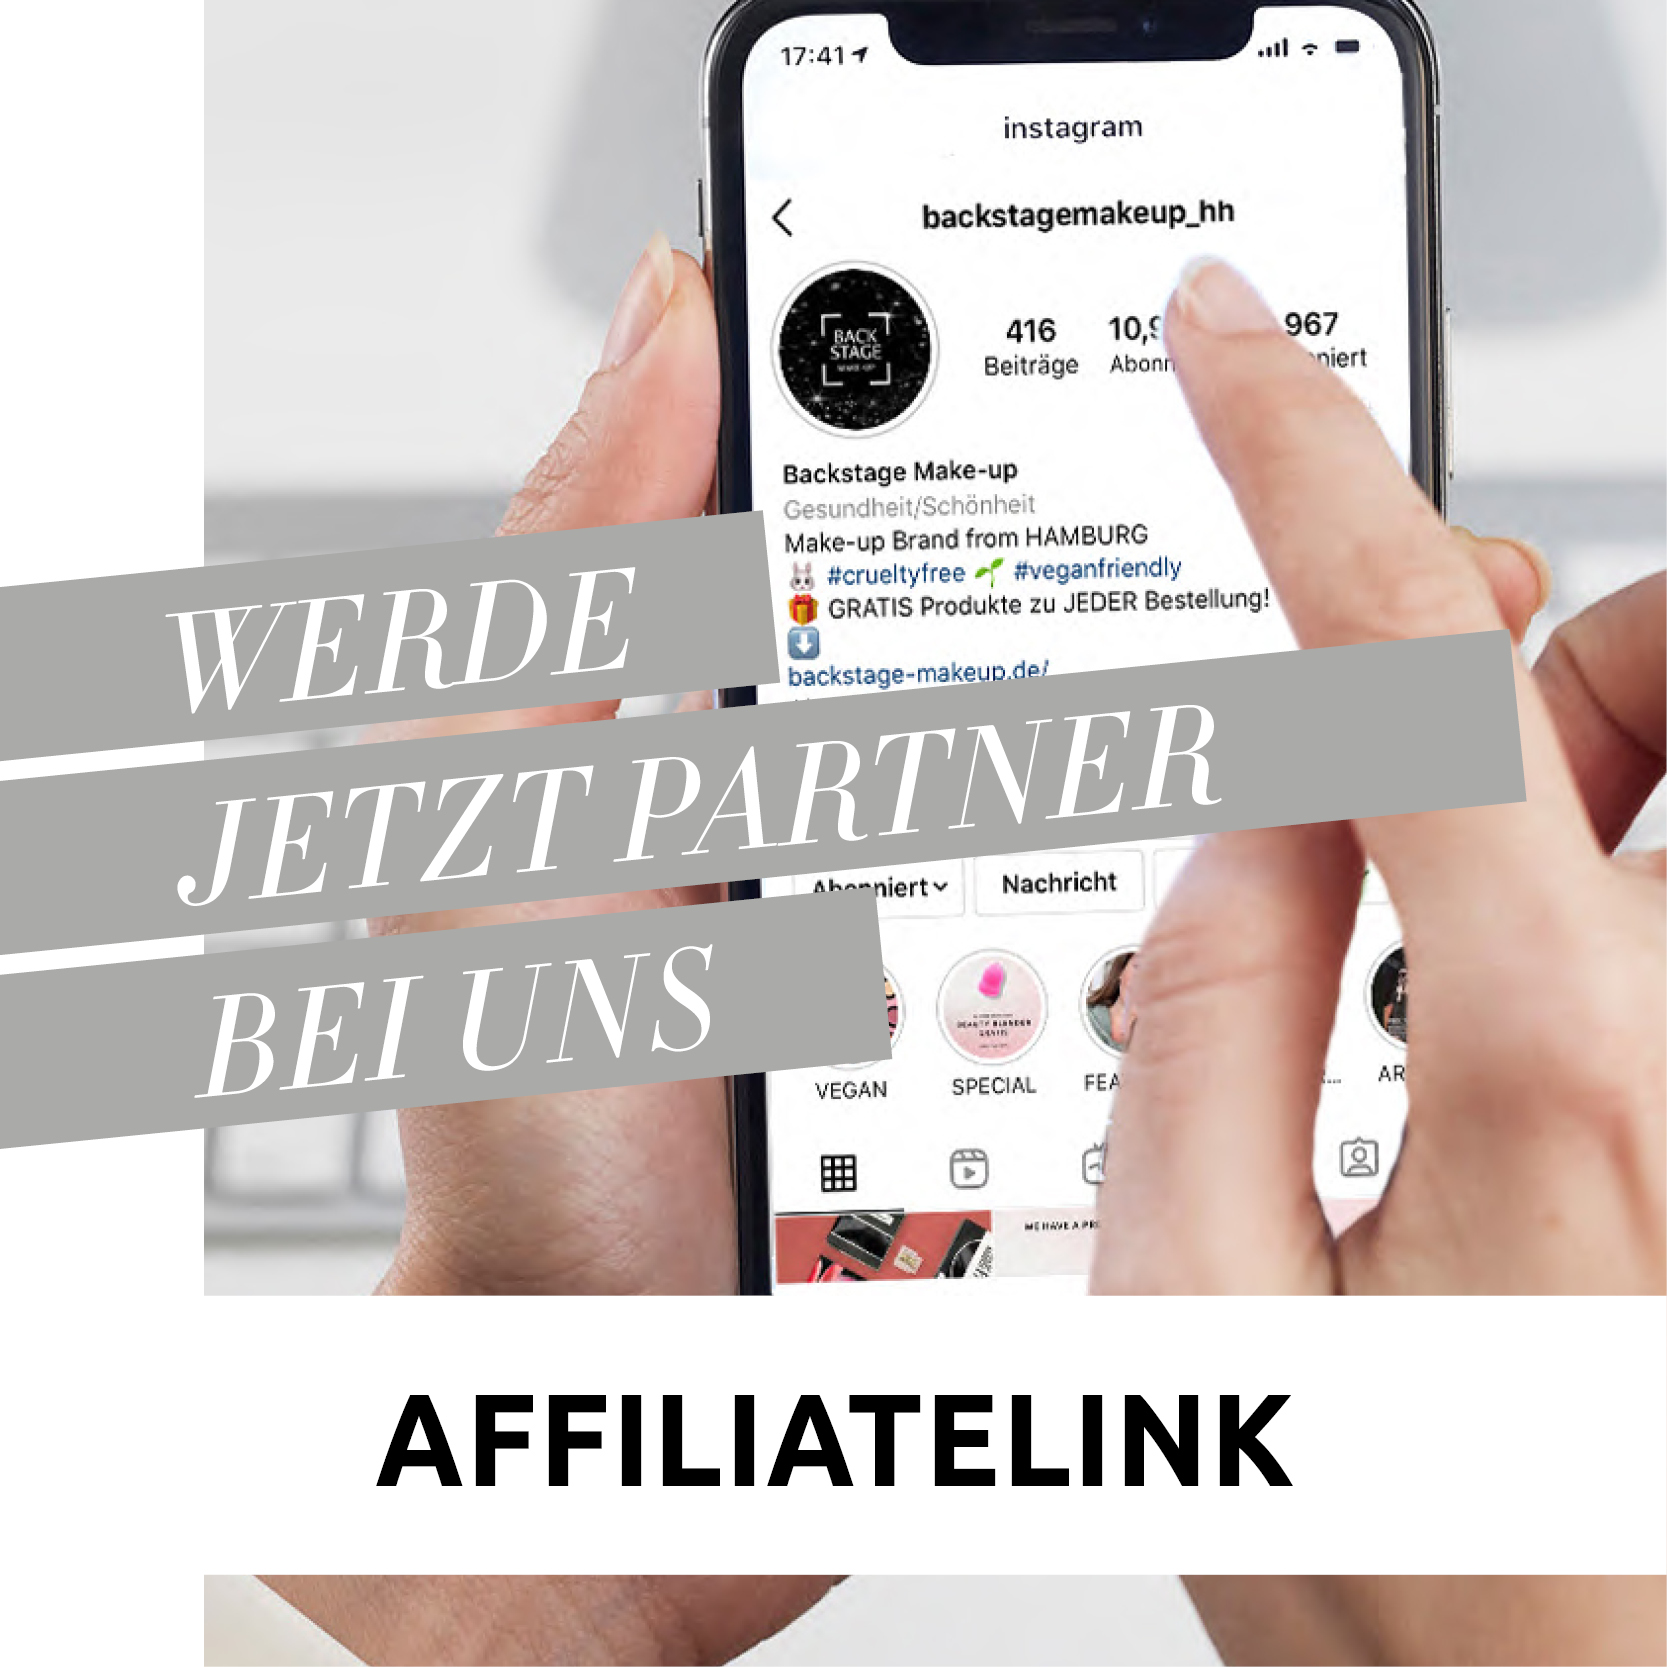 Affiliatelinks - Backstage's Partnerprogramm